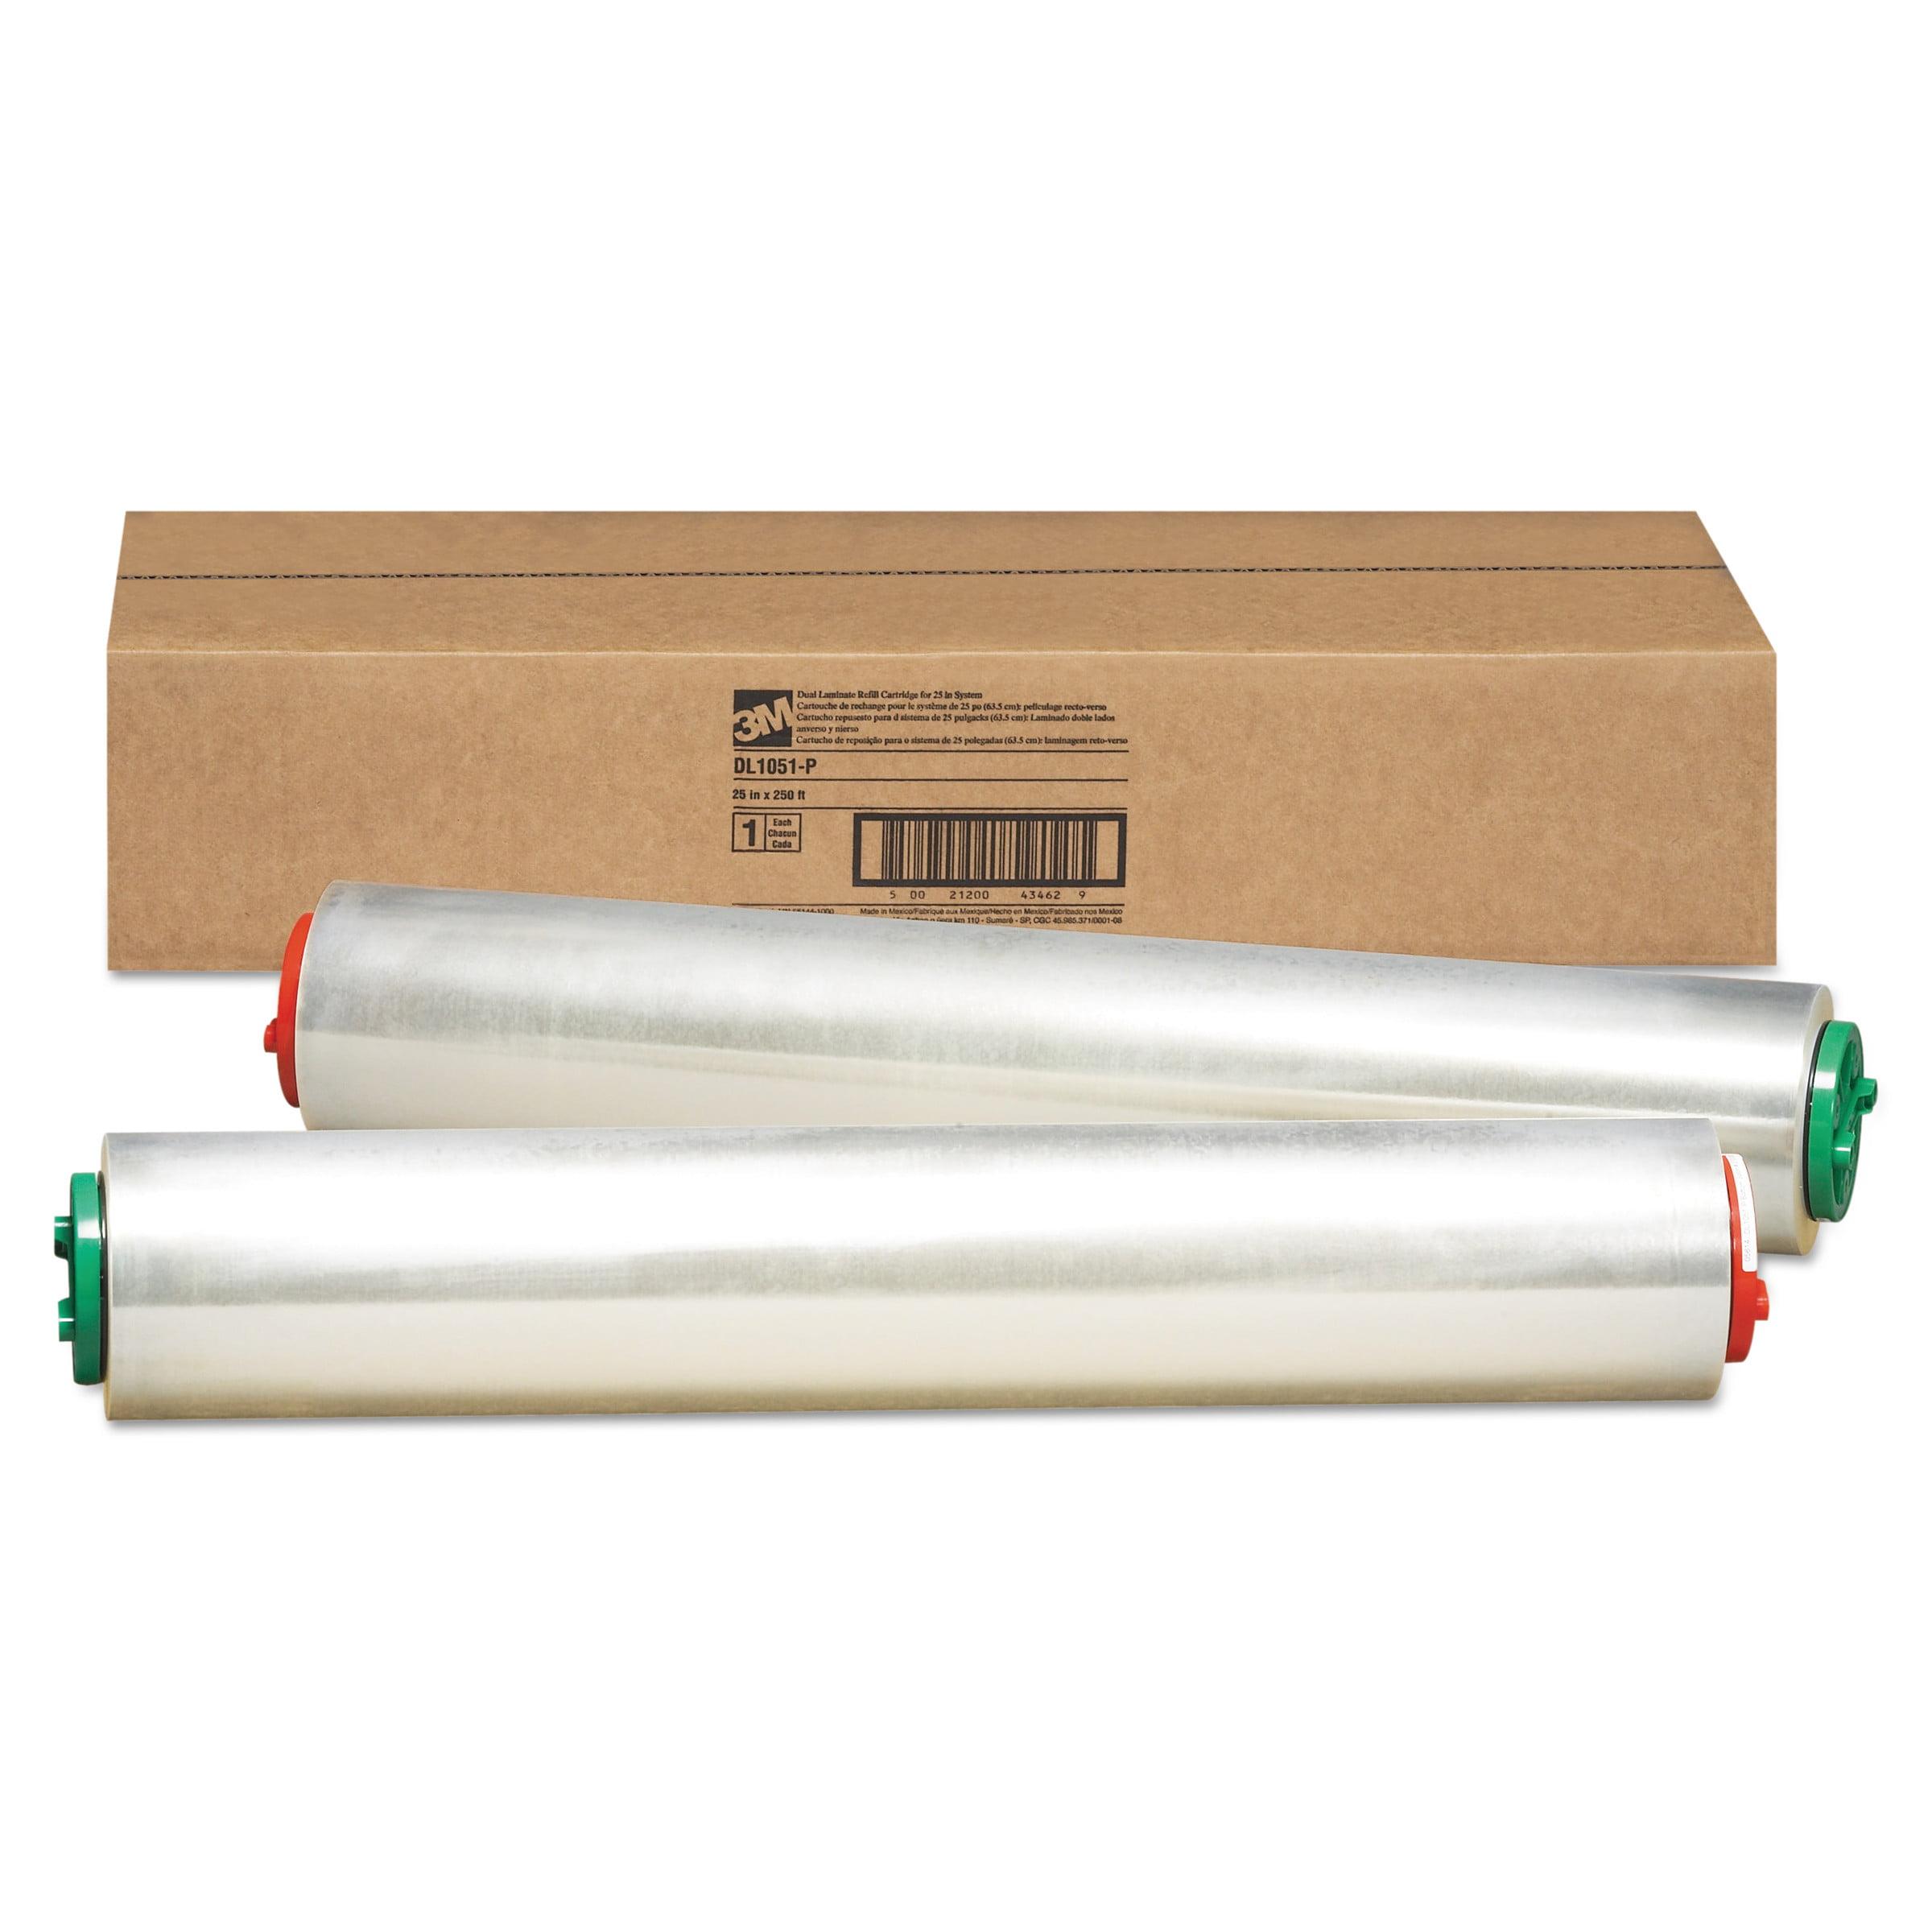 3M Refill Cartridge for Heat-Free Laminating Machines, 250 ft.